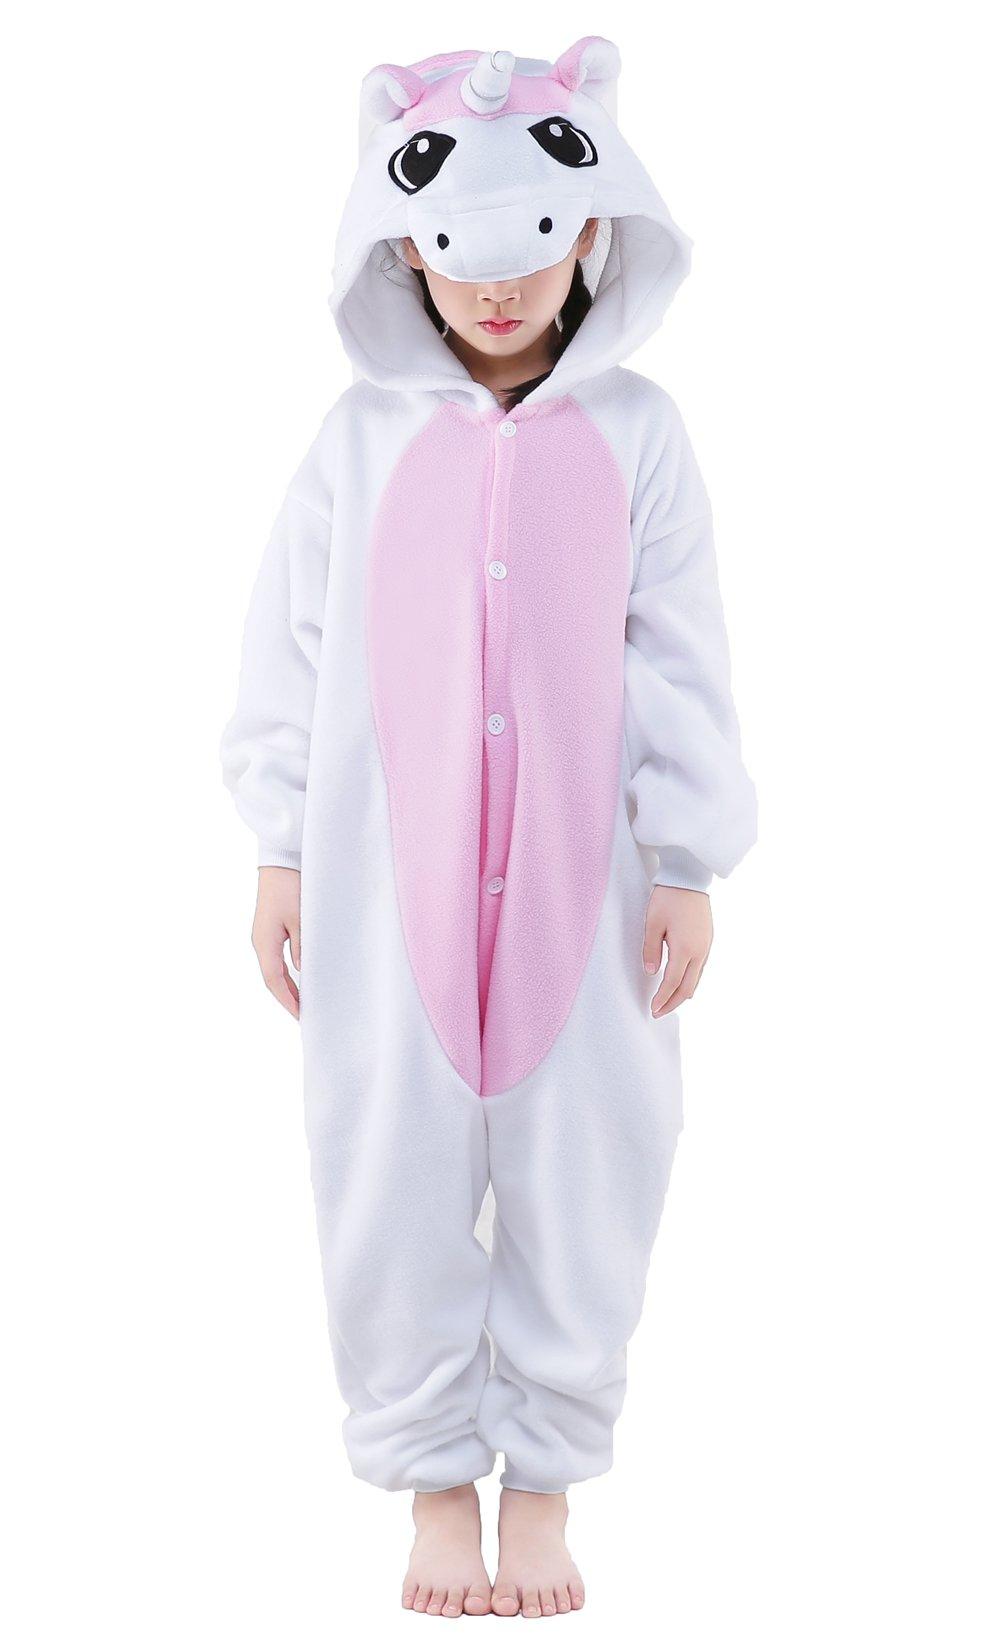 NEWCOSPLAY Childrens Pajamas Sleeping Wear Animal Onesies Cosplay Homewear (125#, Pink Unicorn)